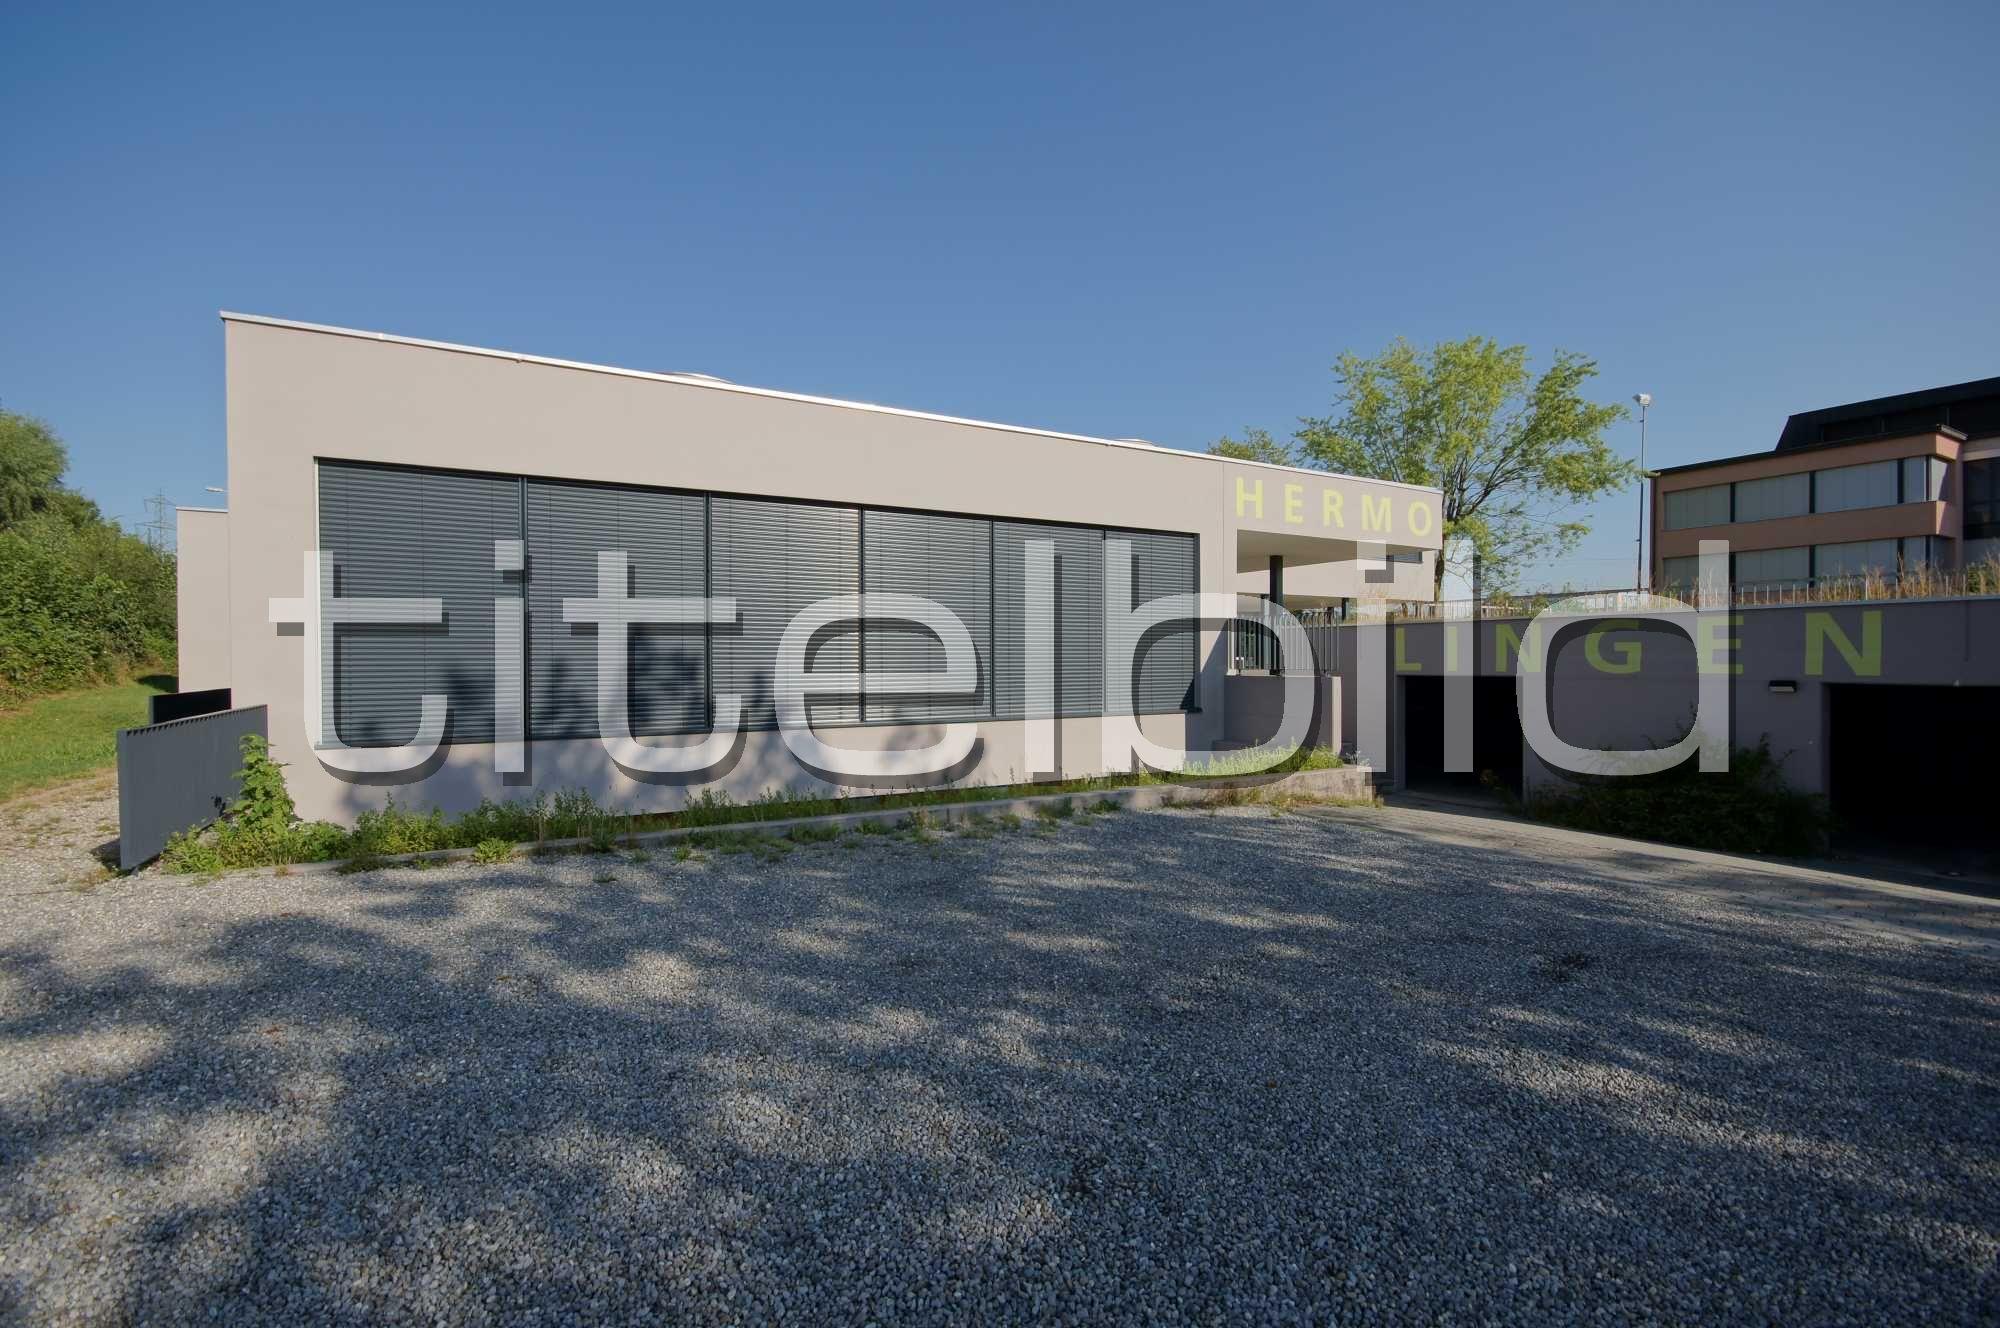 Projektbild-Nr. 3: Schulhaus Hermolingen